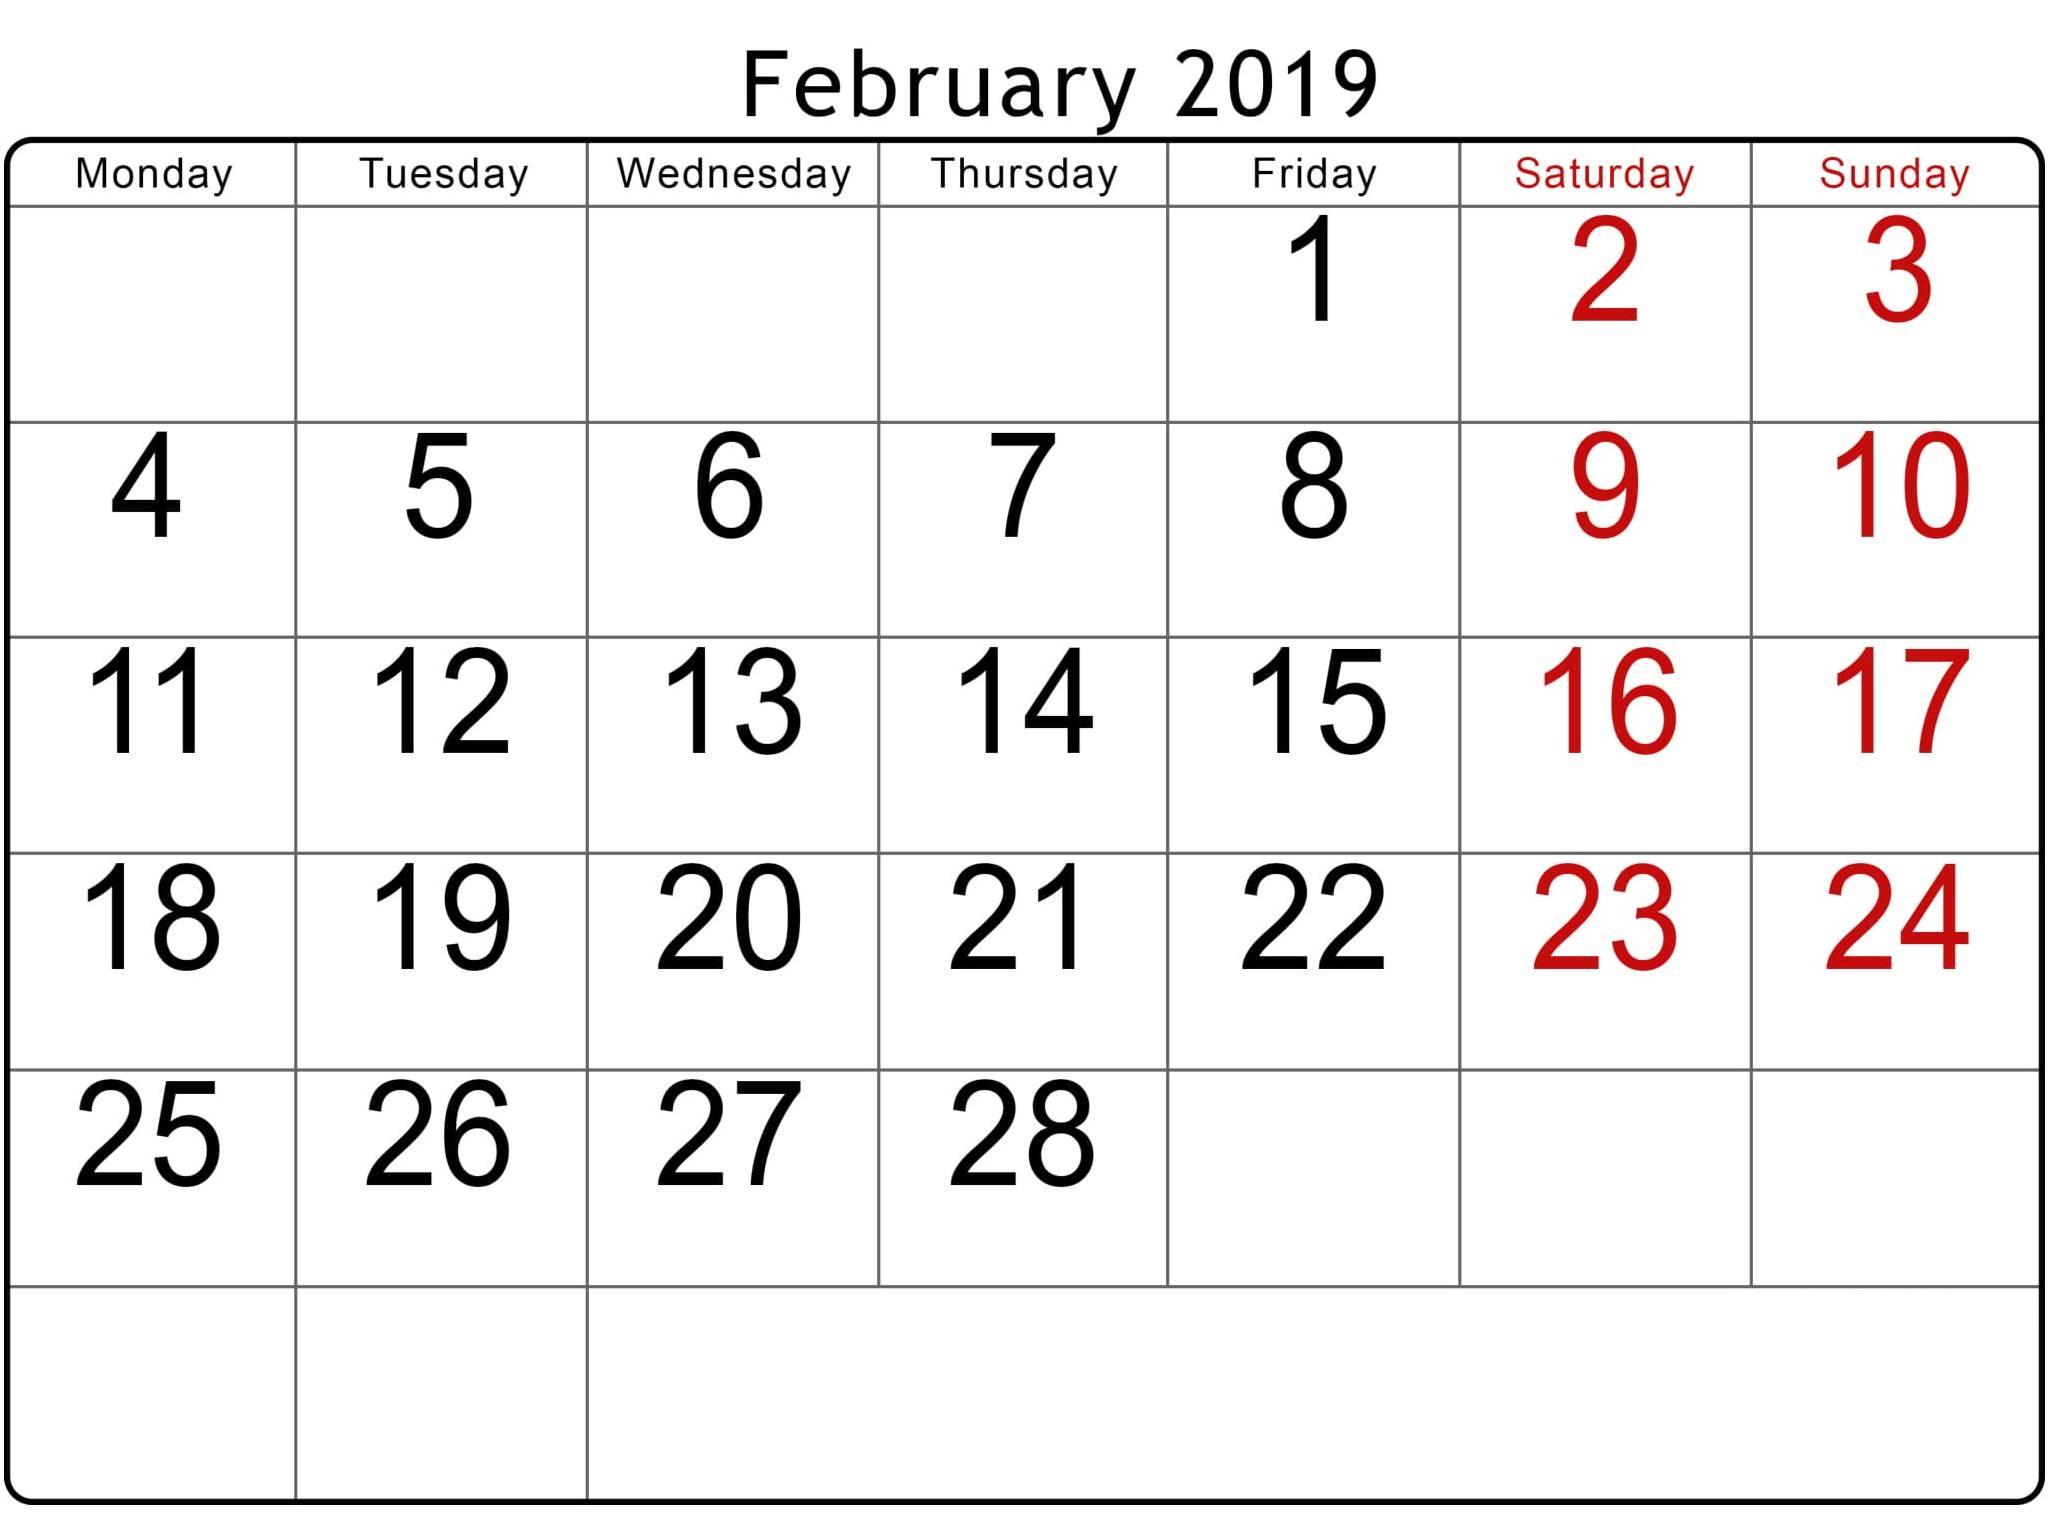 February 2019 Calendar Monday To Sunday - Printable Calendar